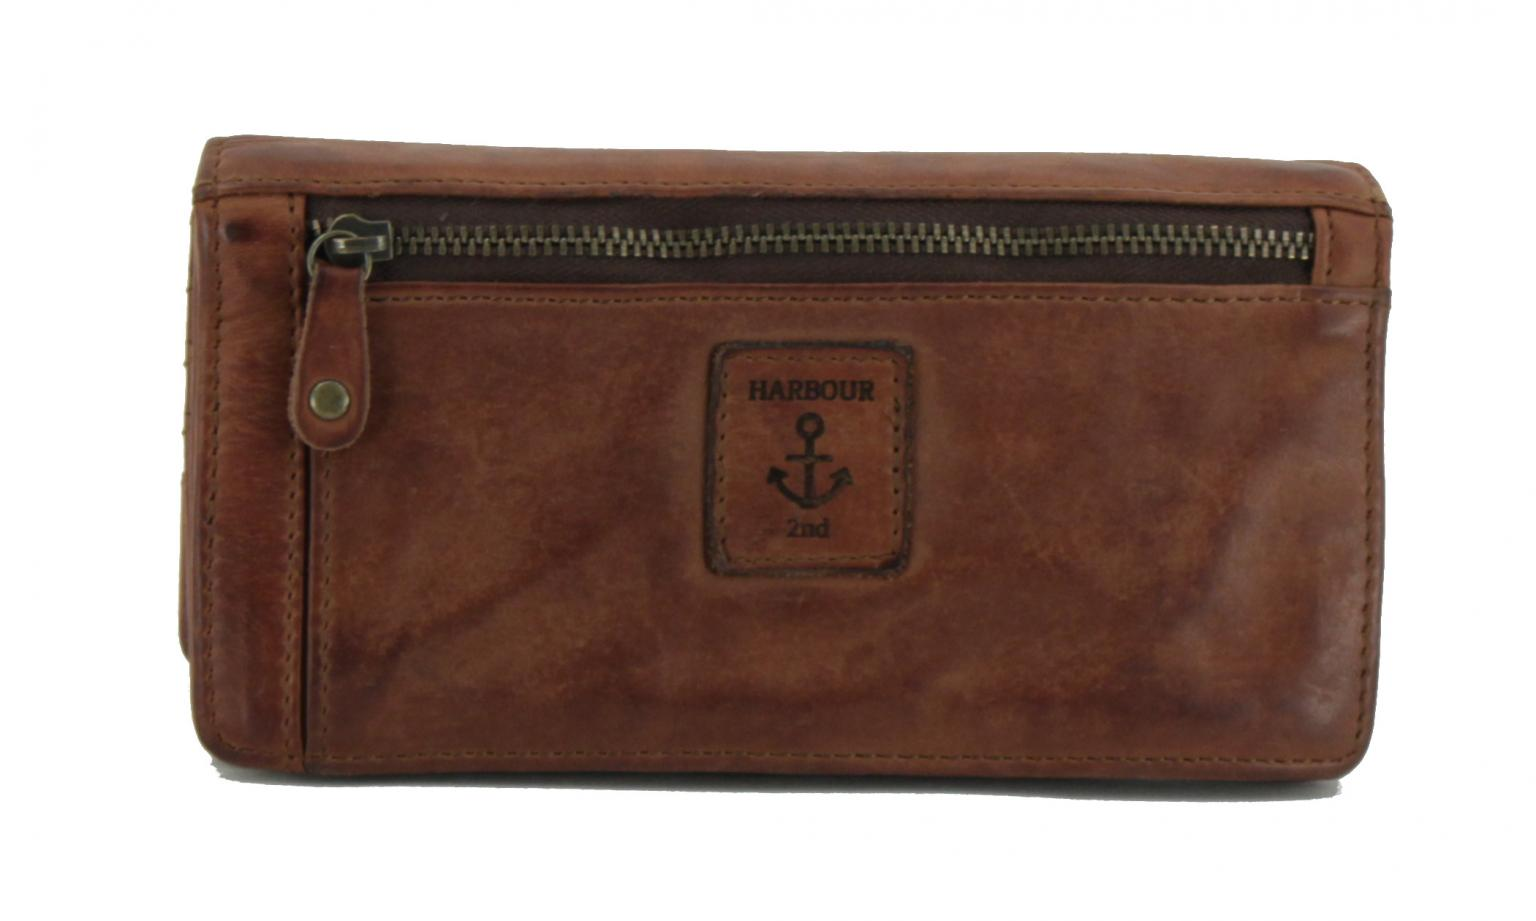 Portemonnaie Überschlag graubraun Leder Harbour 2nd Luja Stone